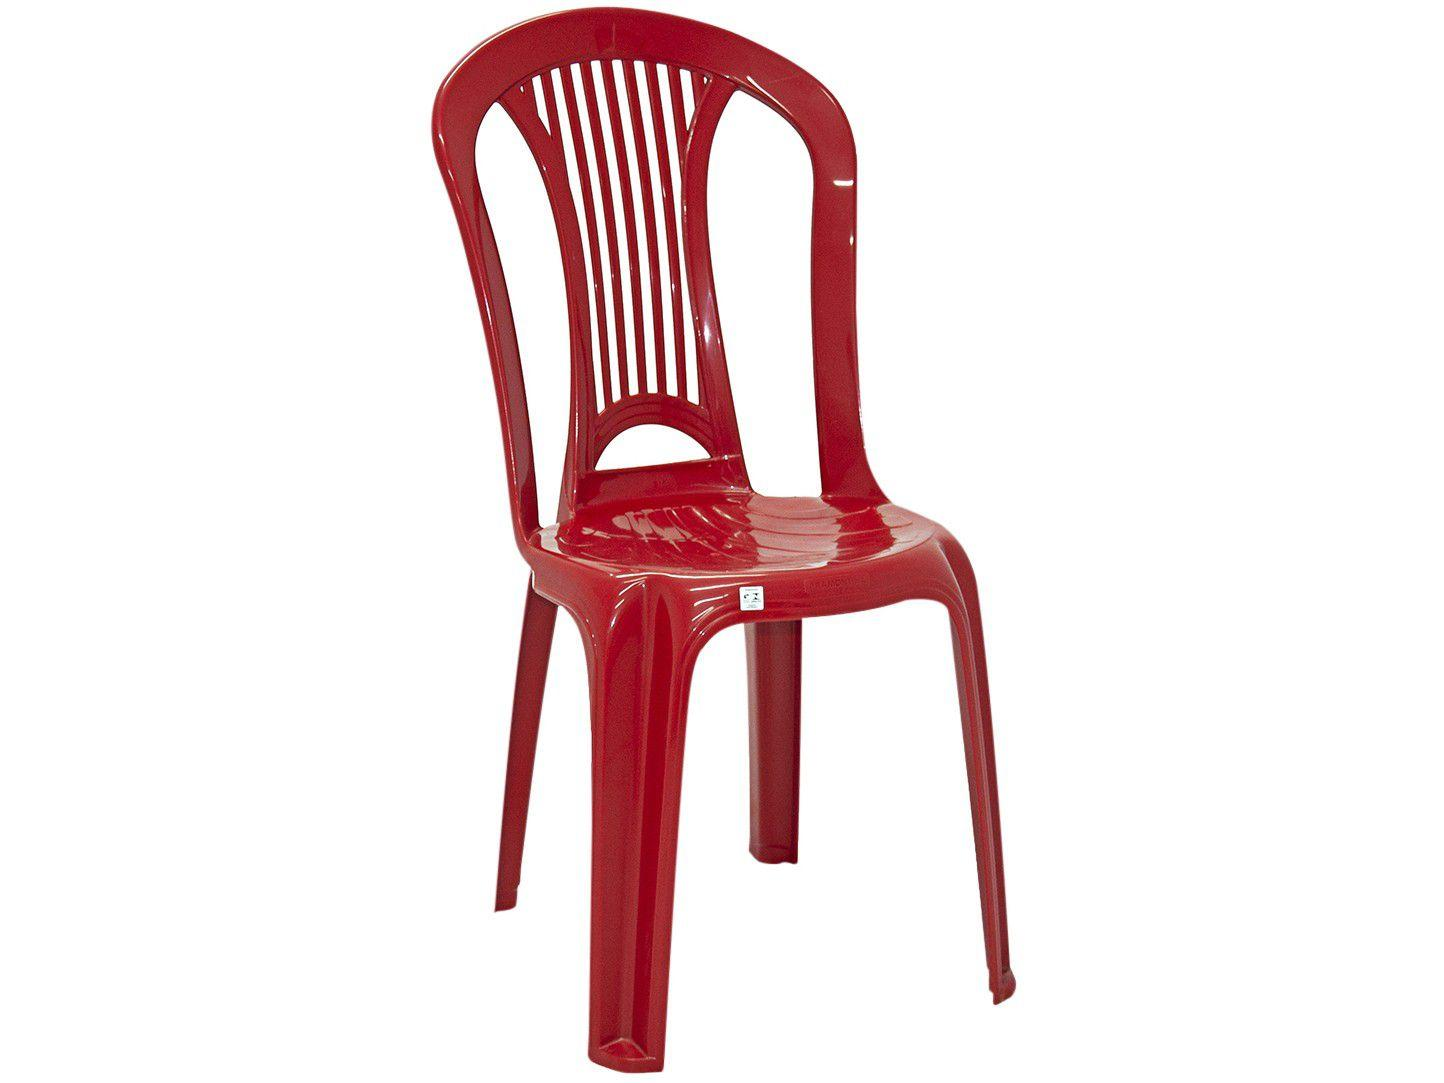 Cadeira Polipropileno Tramontina Basic - Atlântida Economy